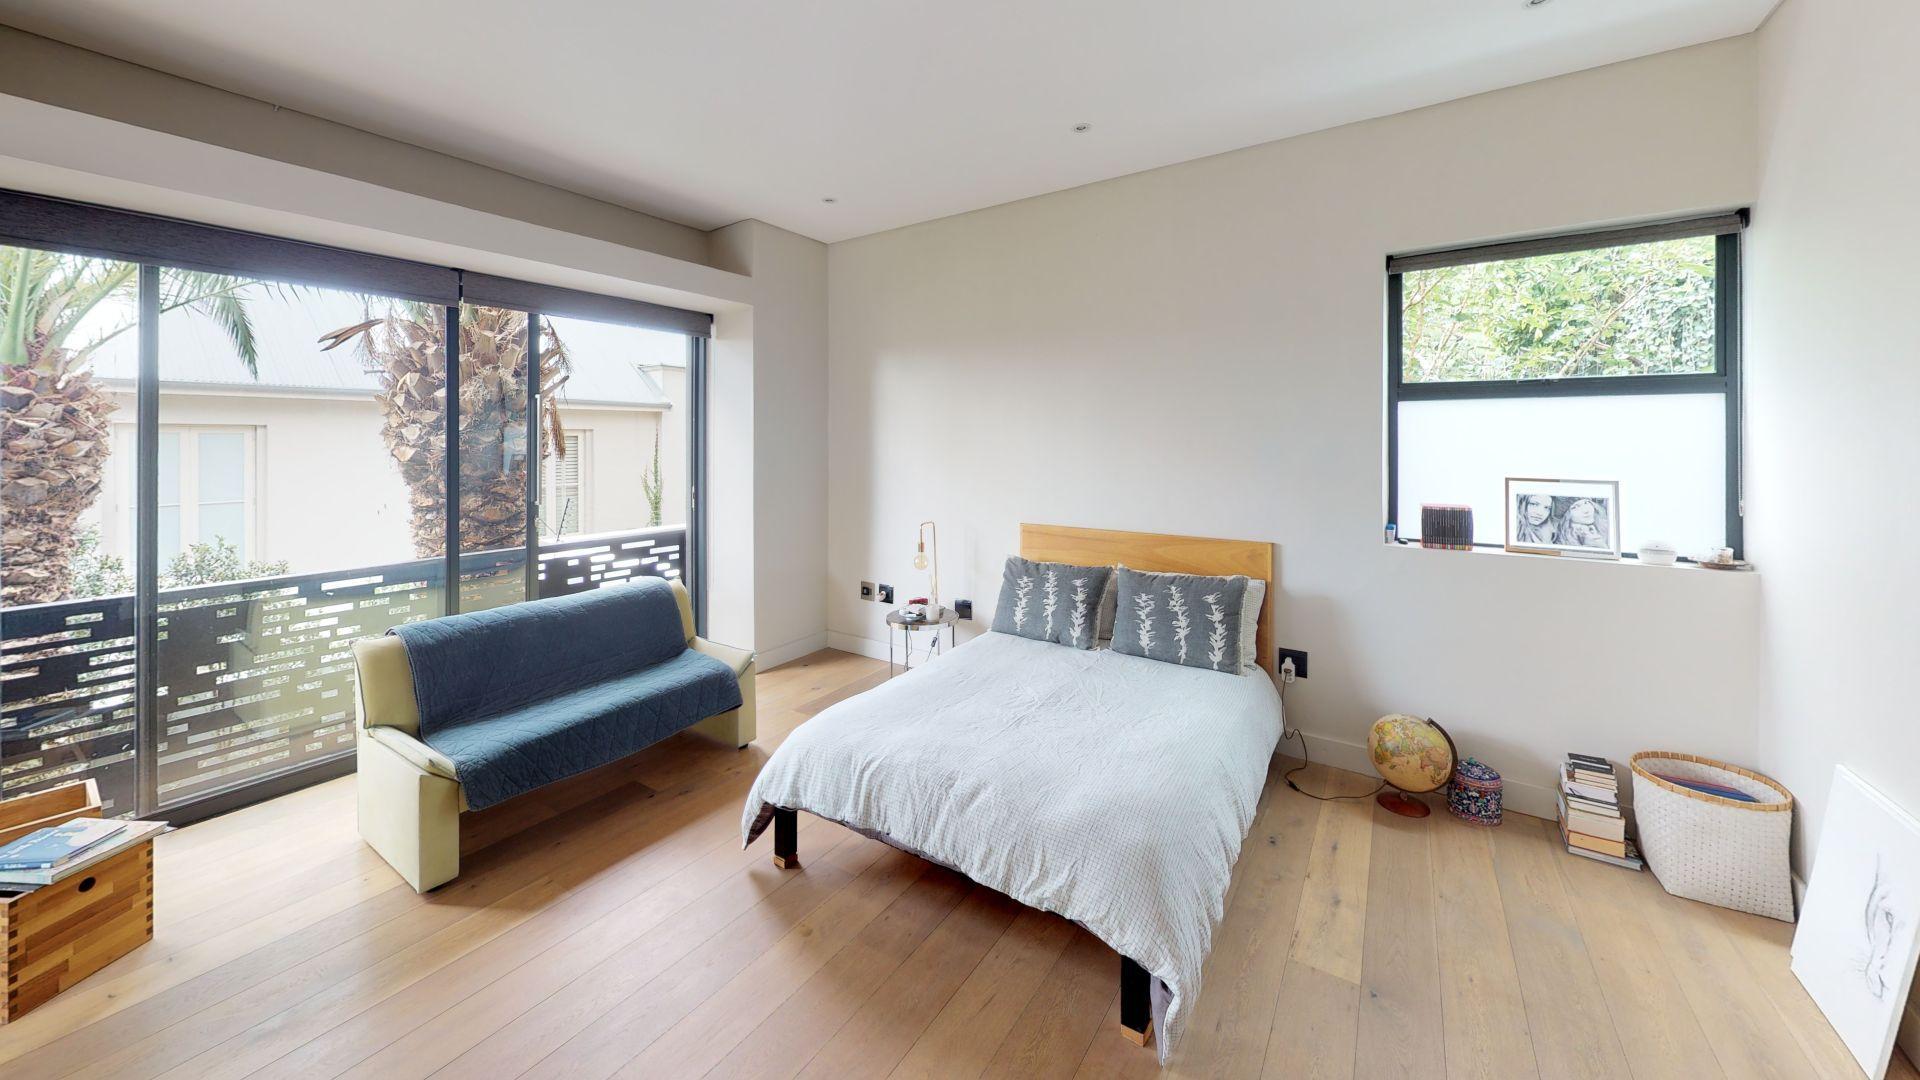 28-Cleveland-Road-Bedroom(3).jpg